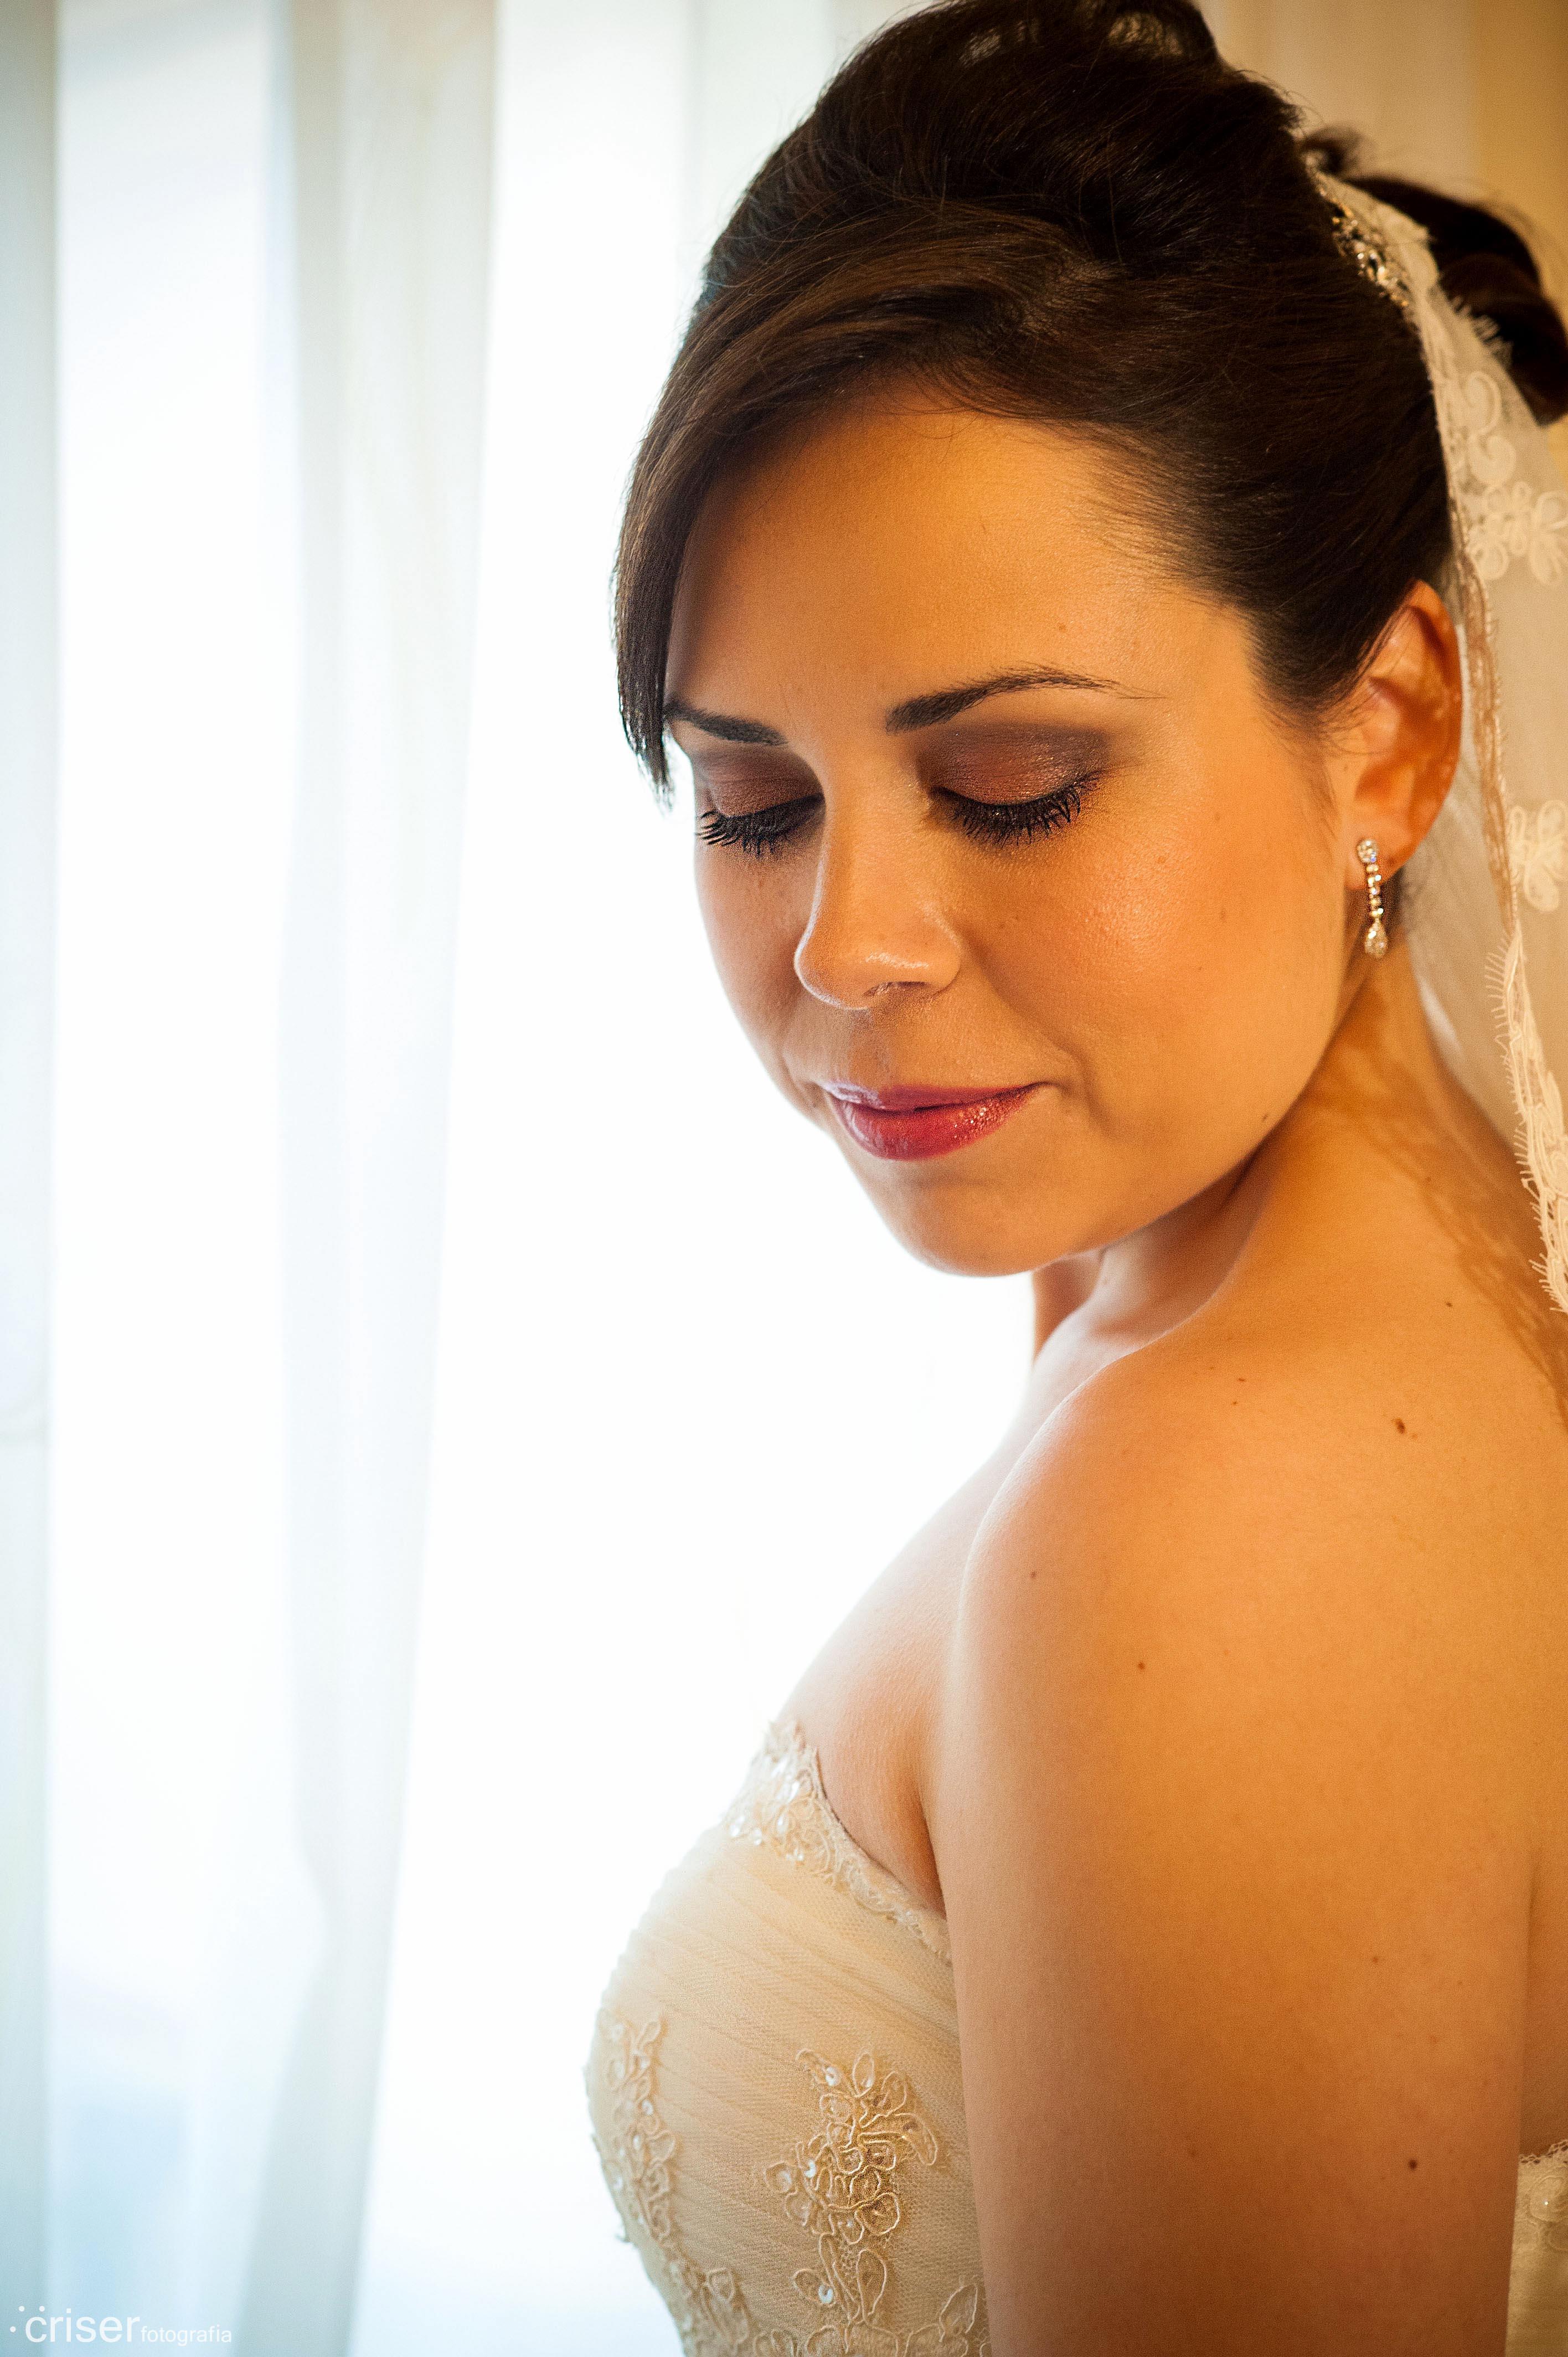 004criserfotografia boda